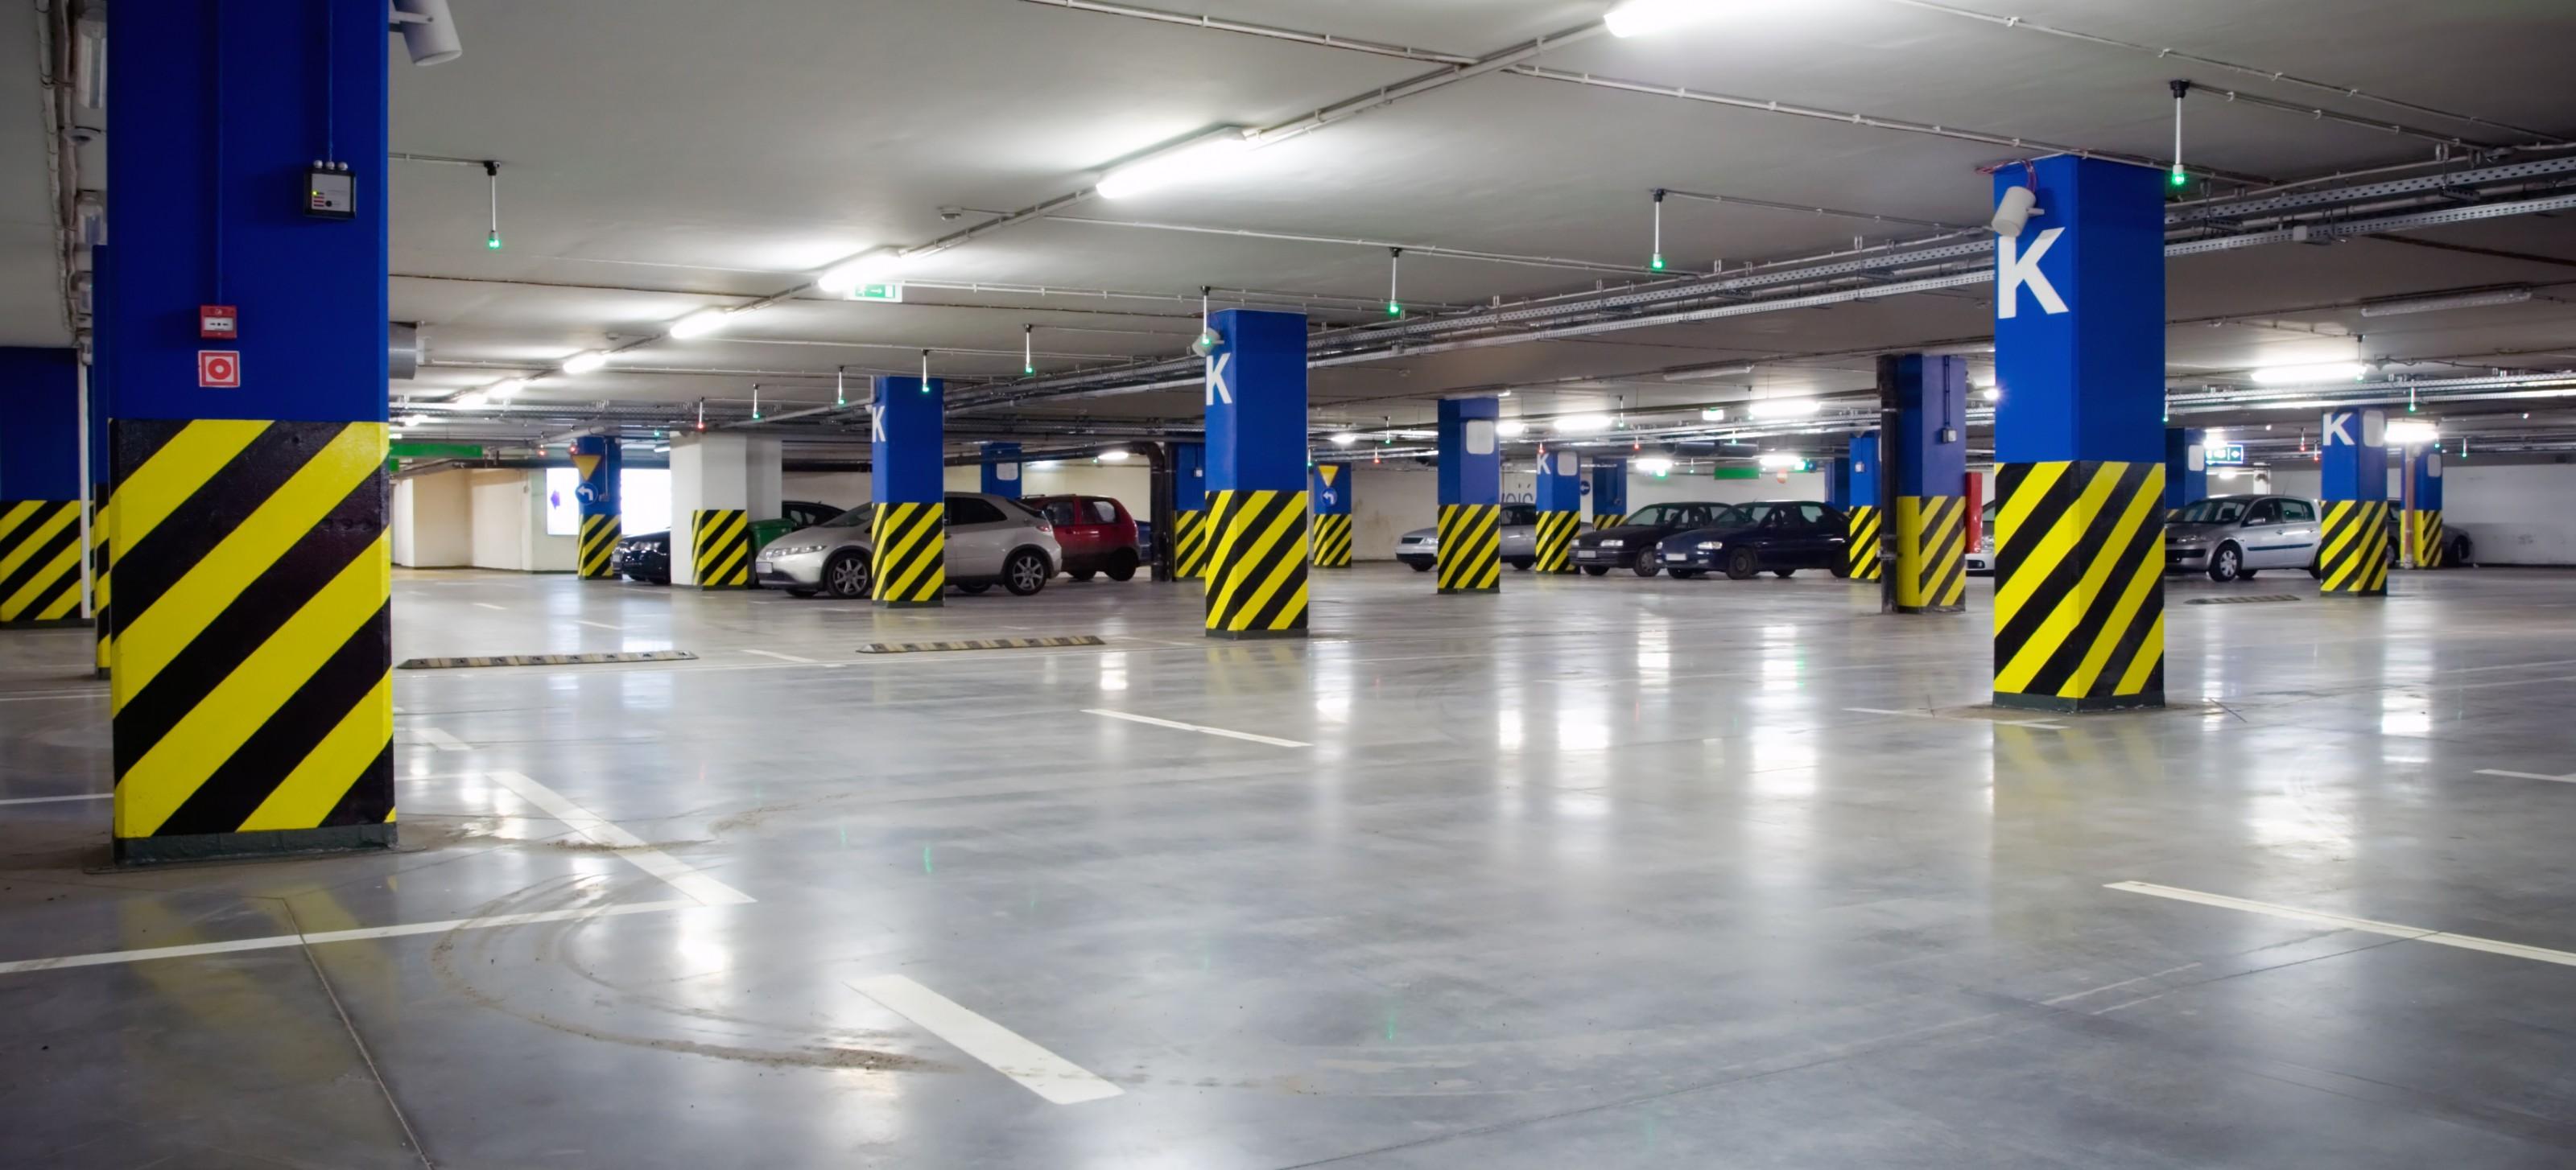 parking deck canopy lighting